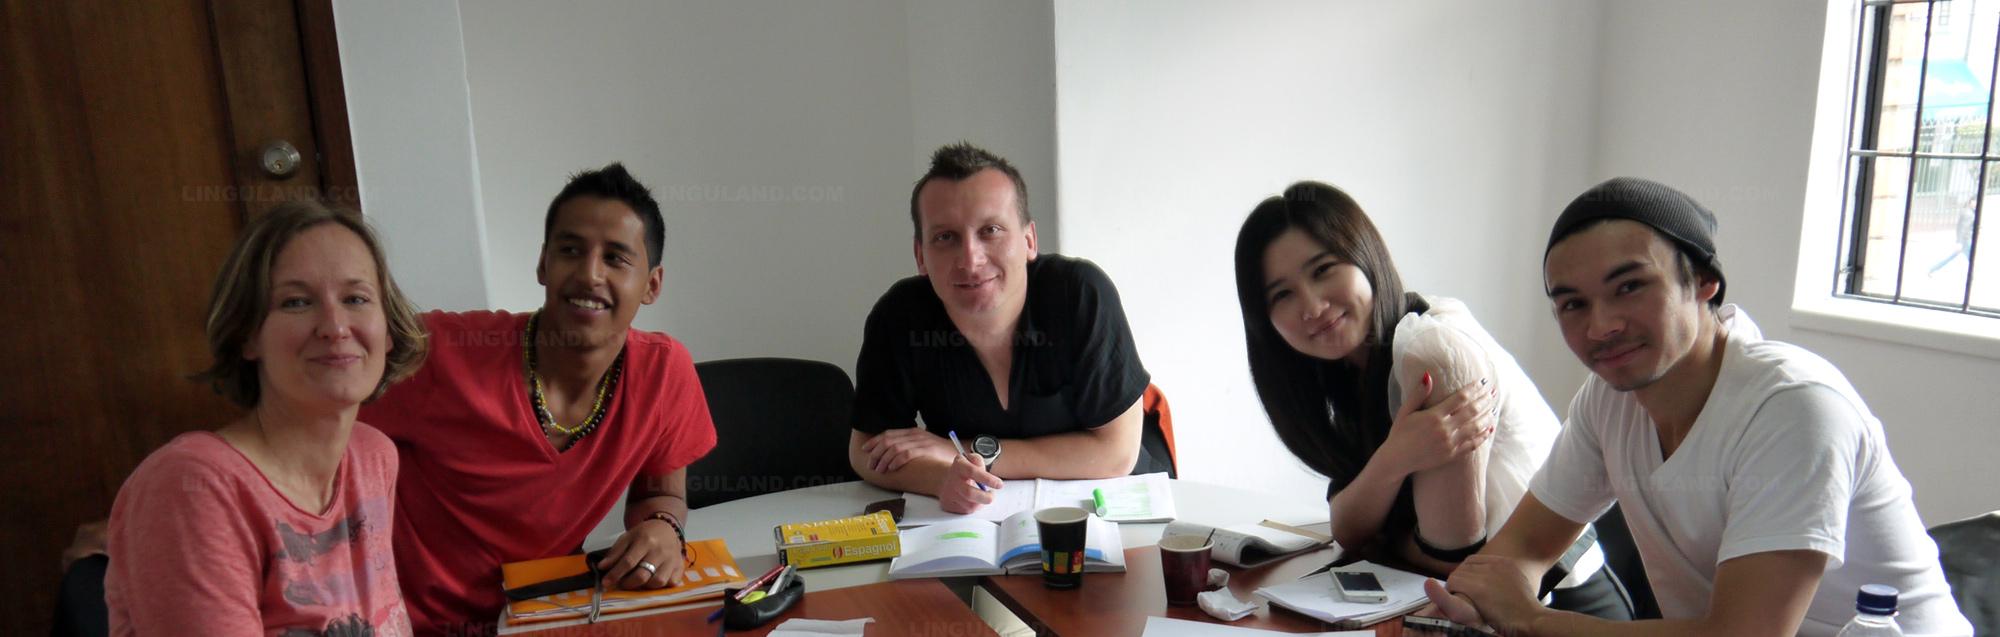 Sprachschule Nueva Lengua Cartagena